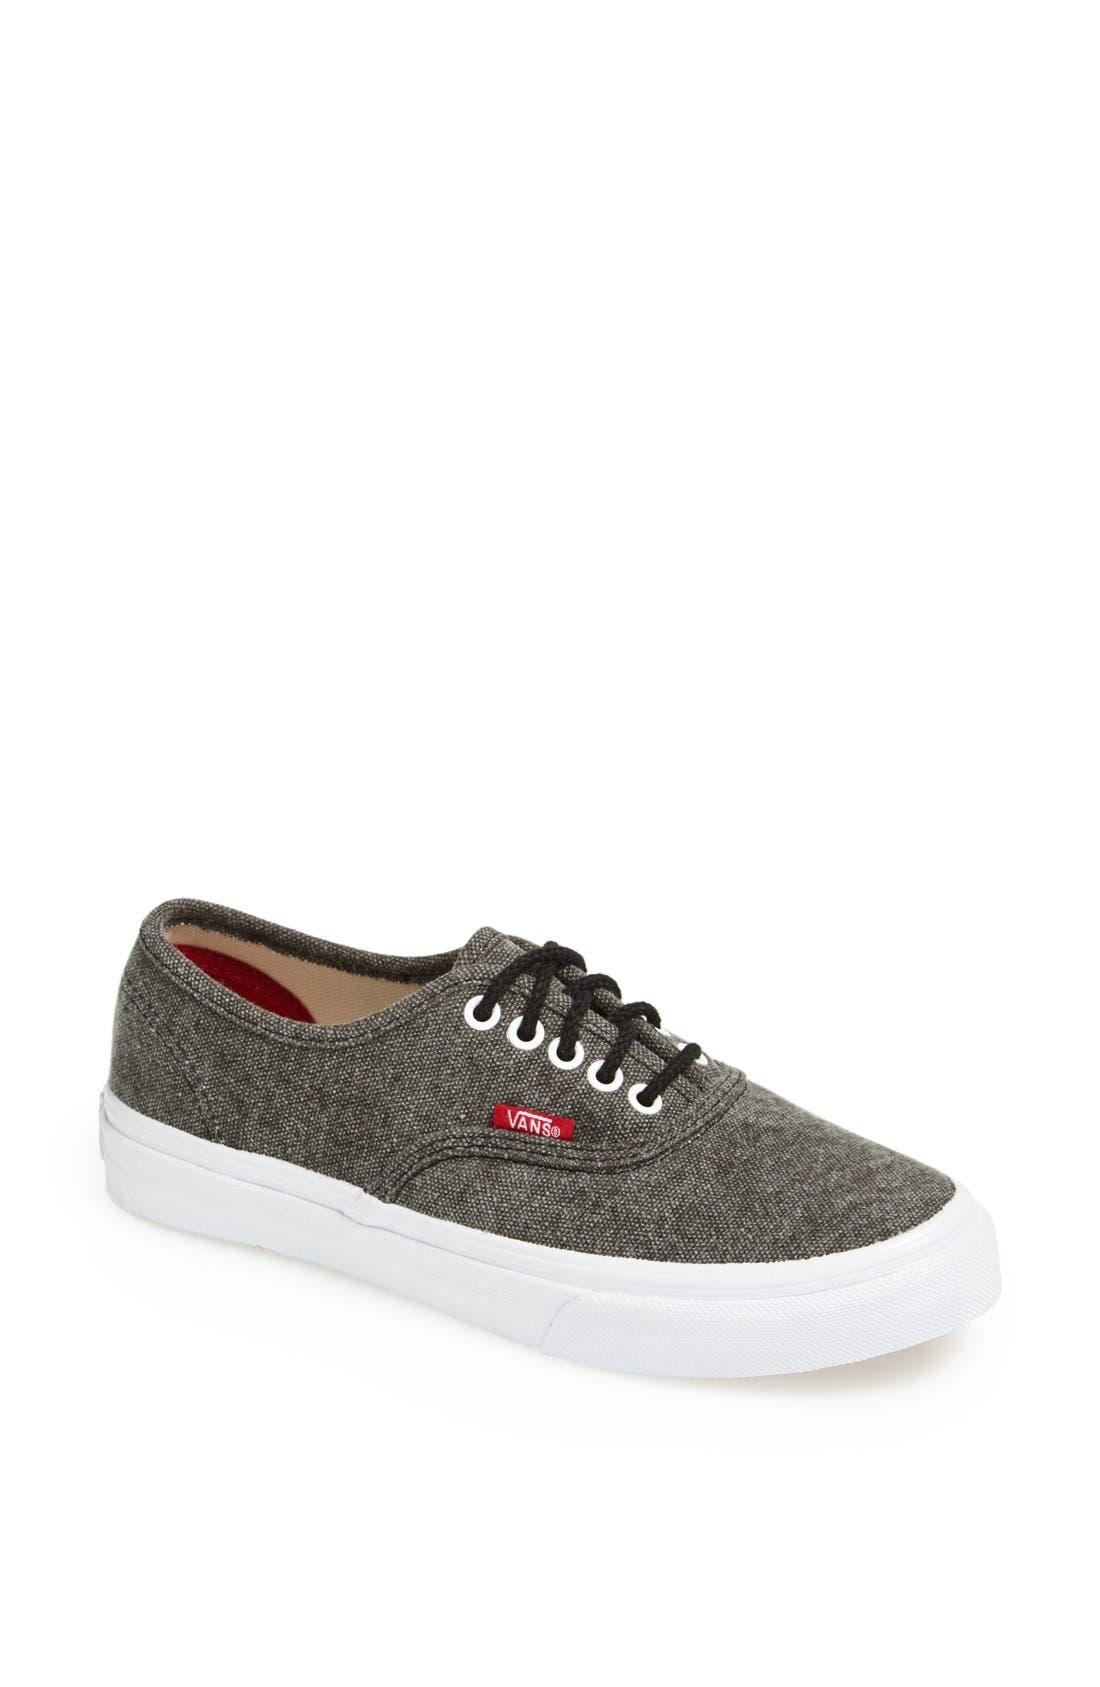 Alternate Image 1 Selected - Vans 'Authentic - Slim' Canvas Sneaker (Women)